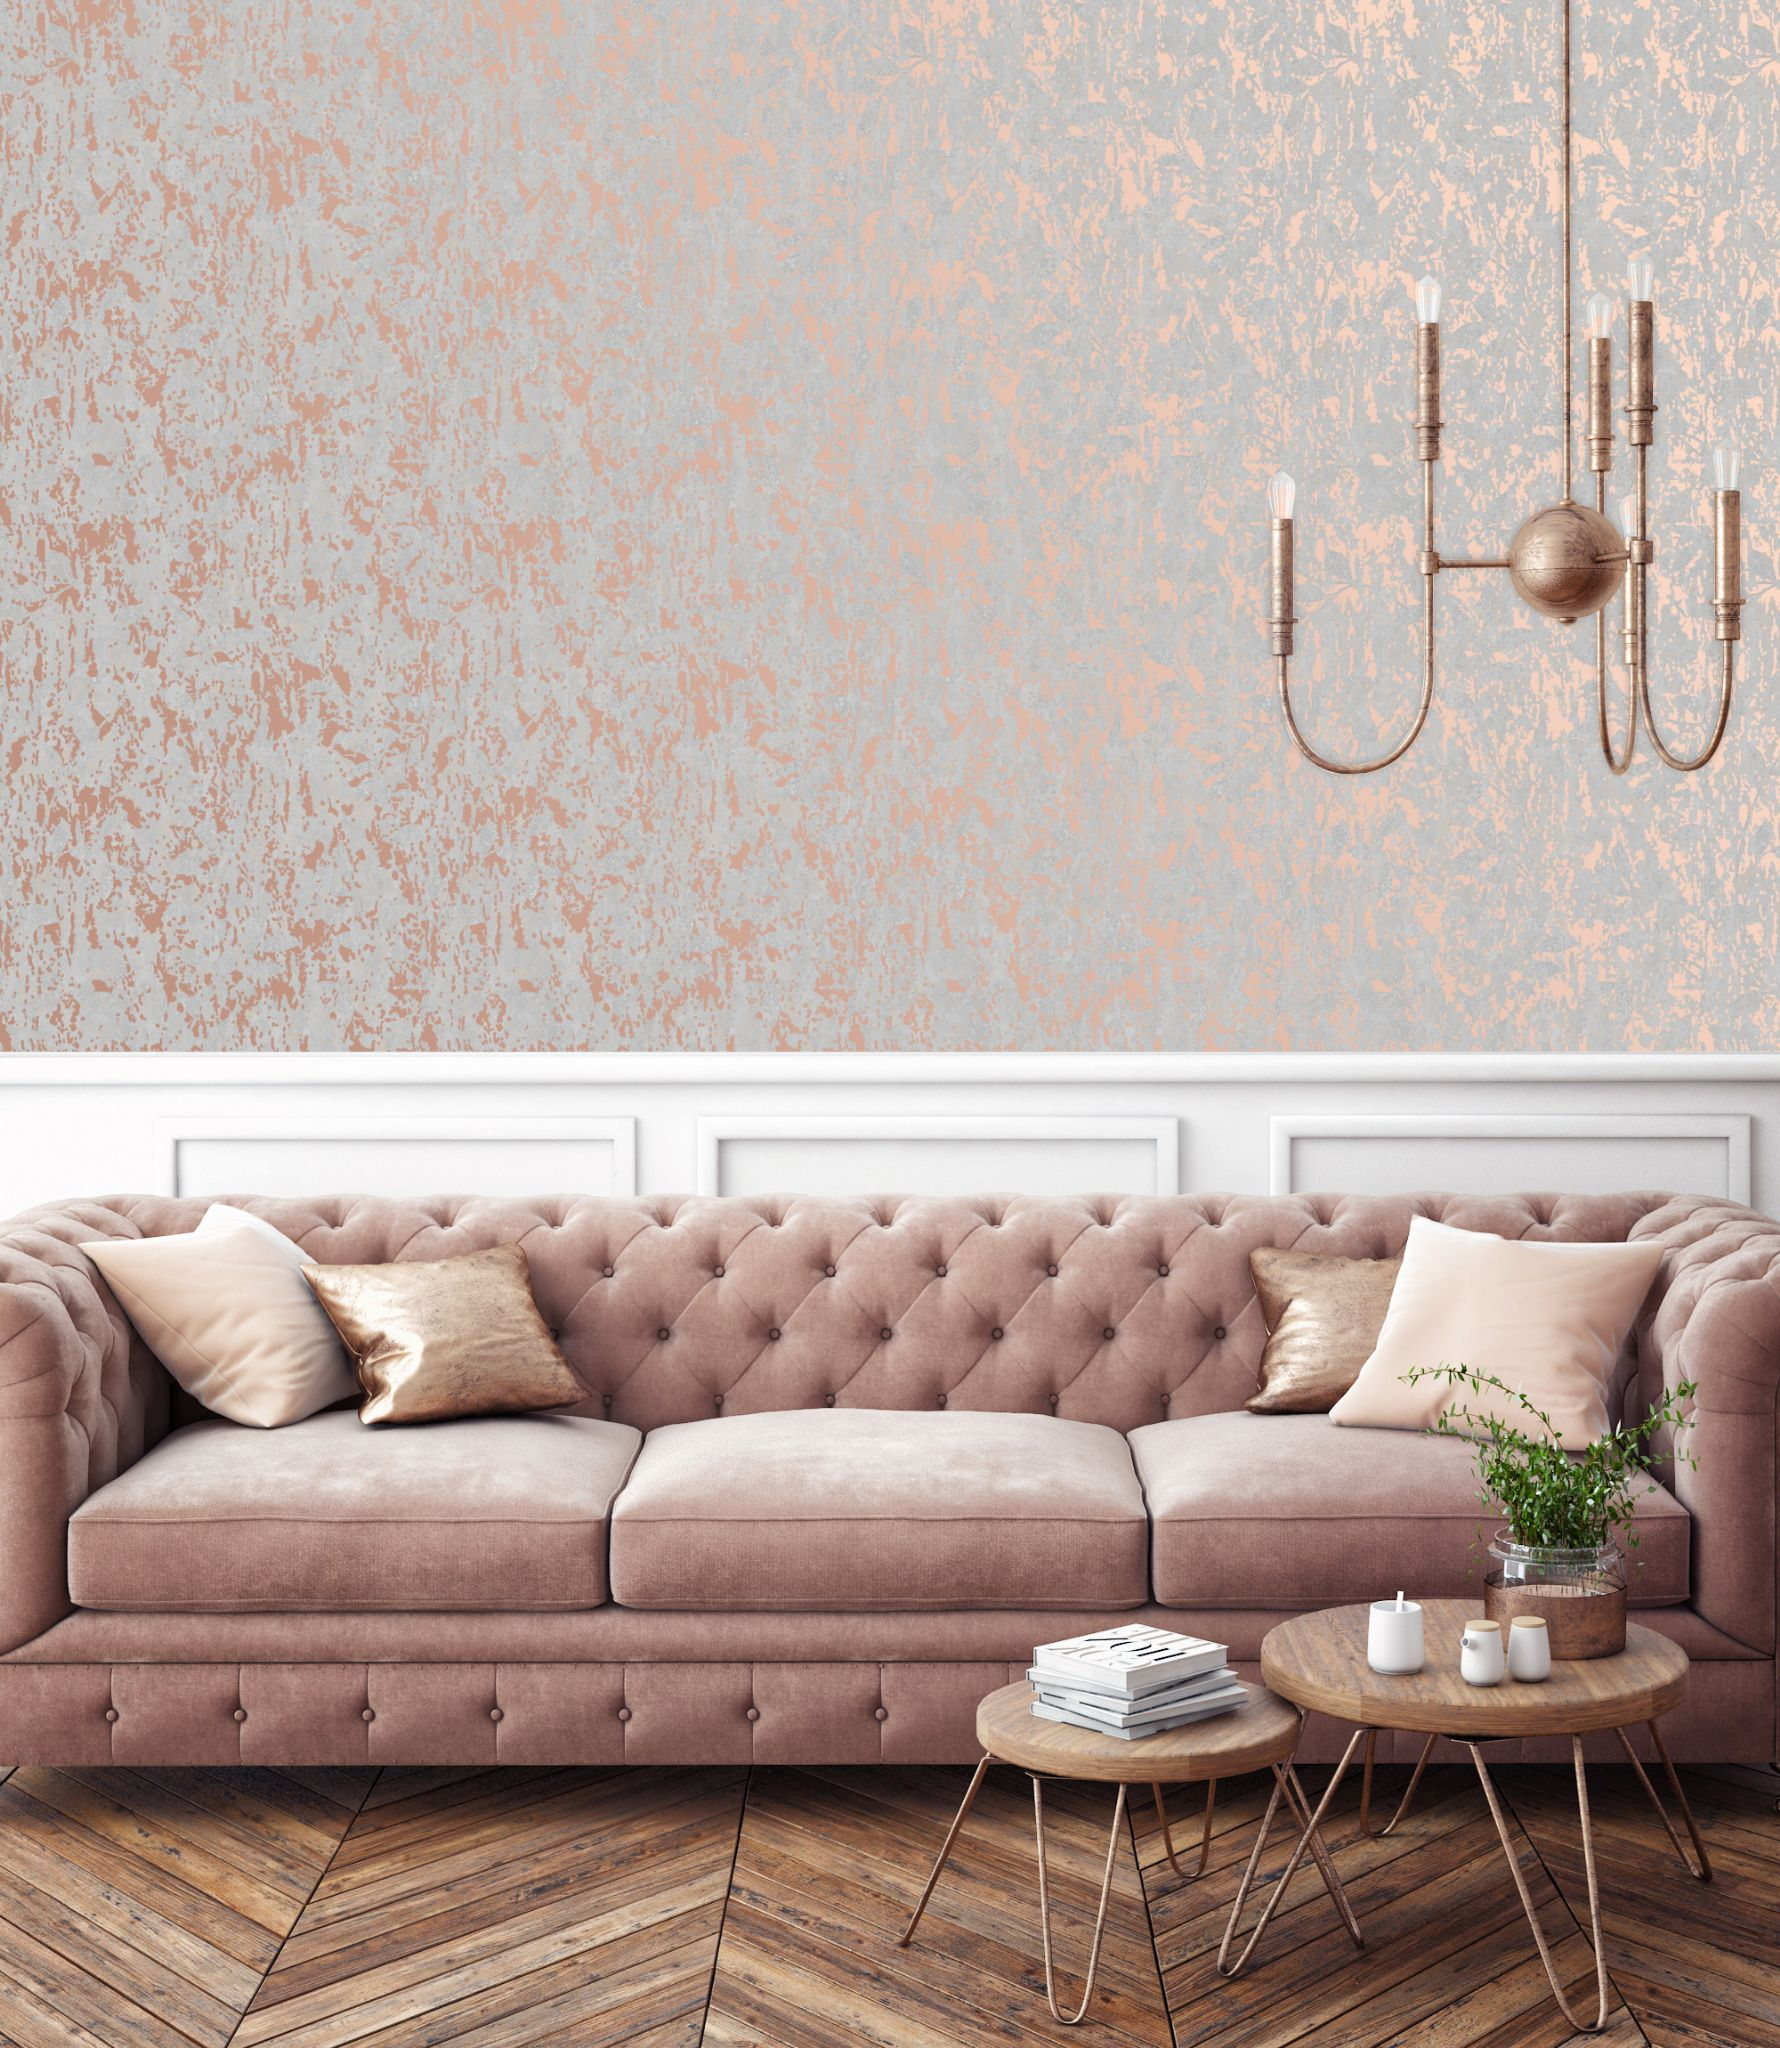 Strange Graham And Brown Milan Rose Gold 106401 Wallpaper Lamtechconsult Wood Chair Design Ideas Lamtechconsultcom